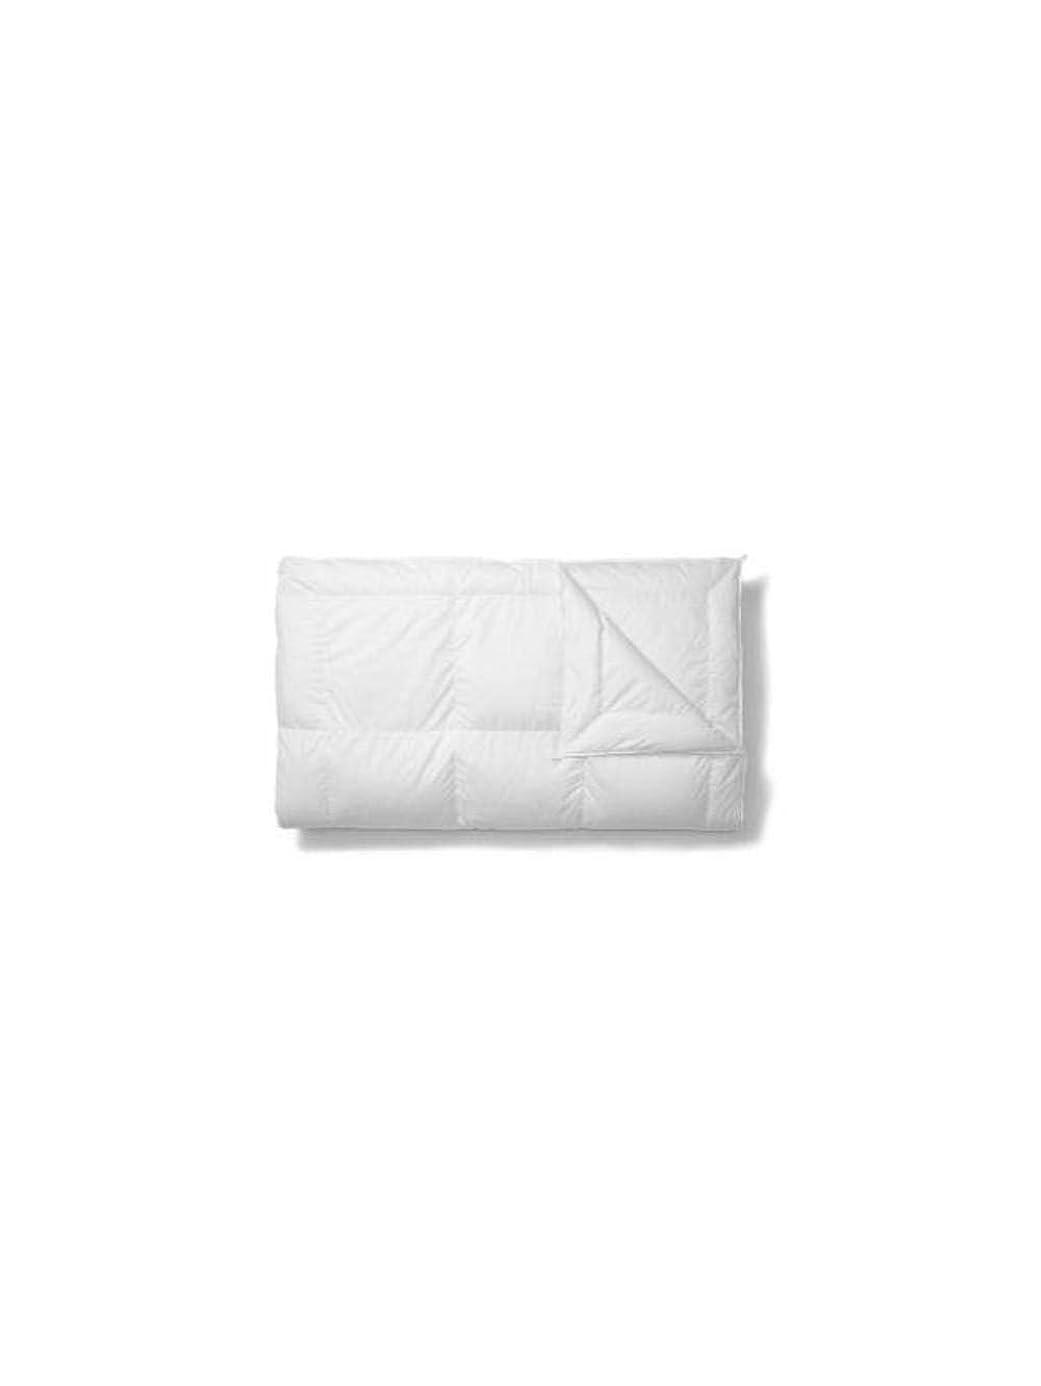 Eddie Bauer Unisex-Adult Rainier Medium Down Comforter, White King King jvf6064844